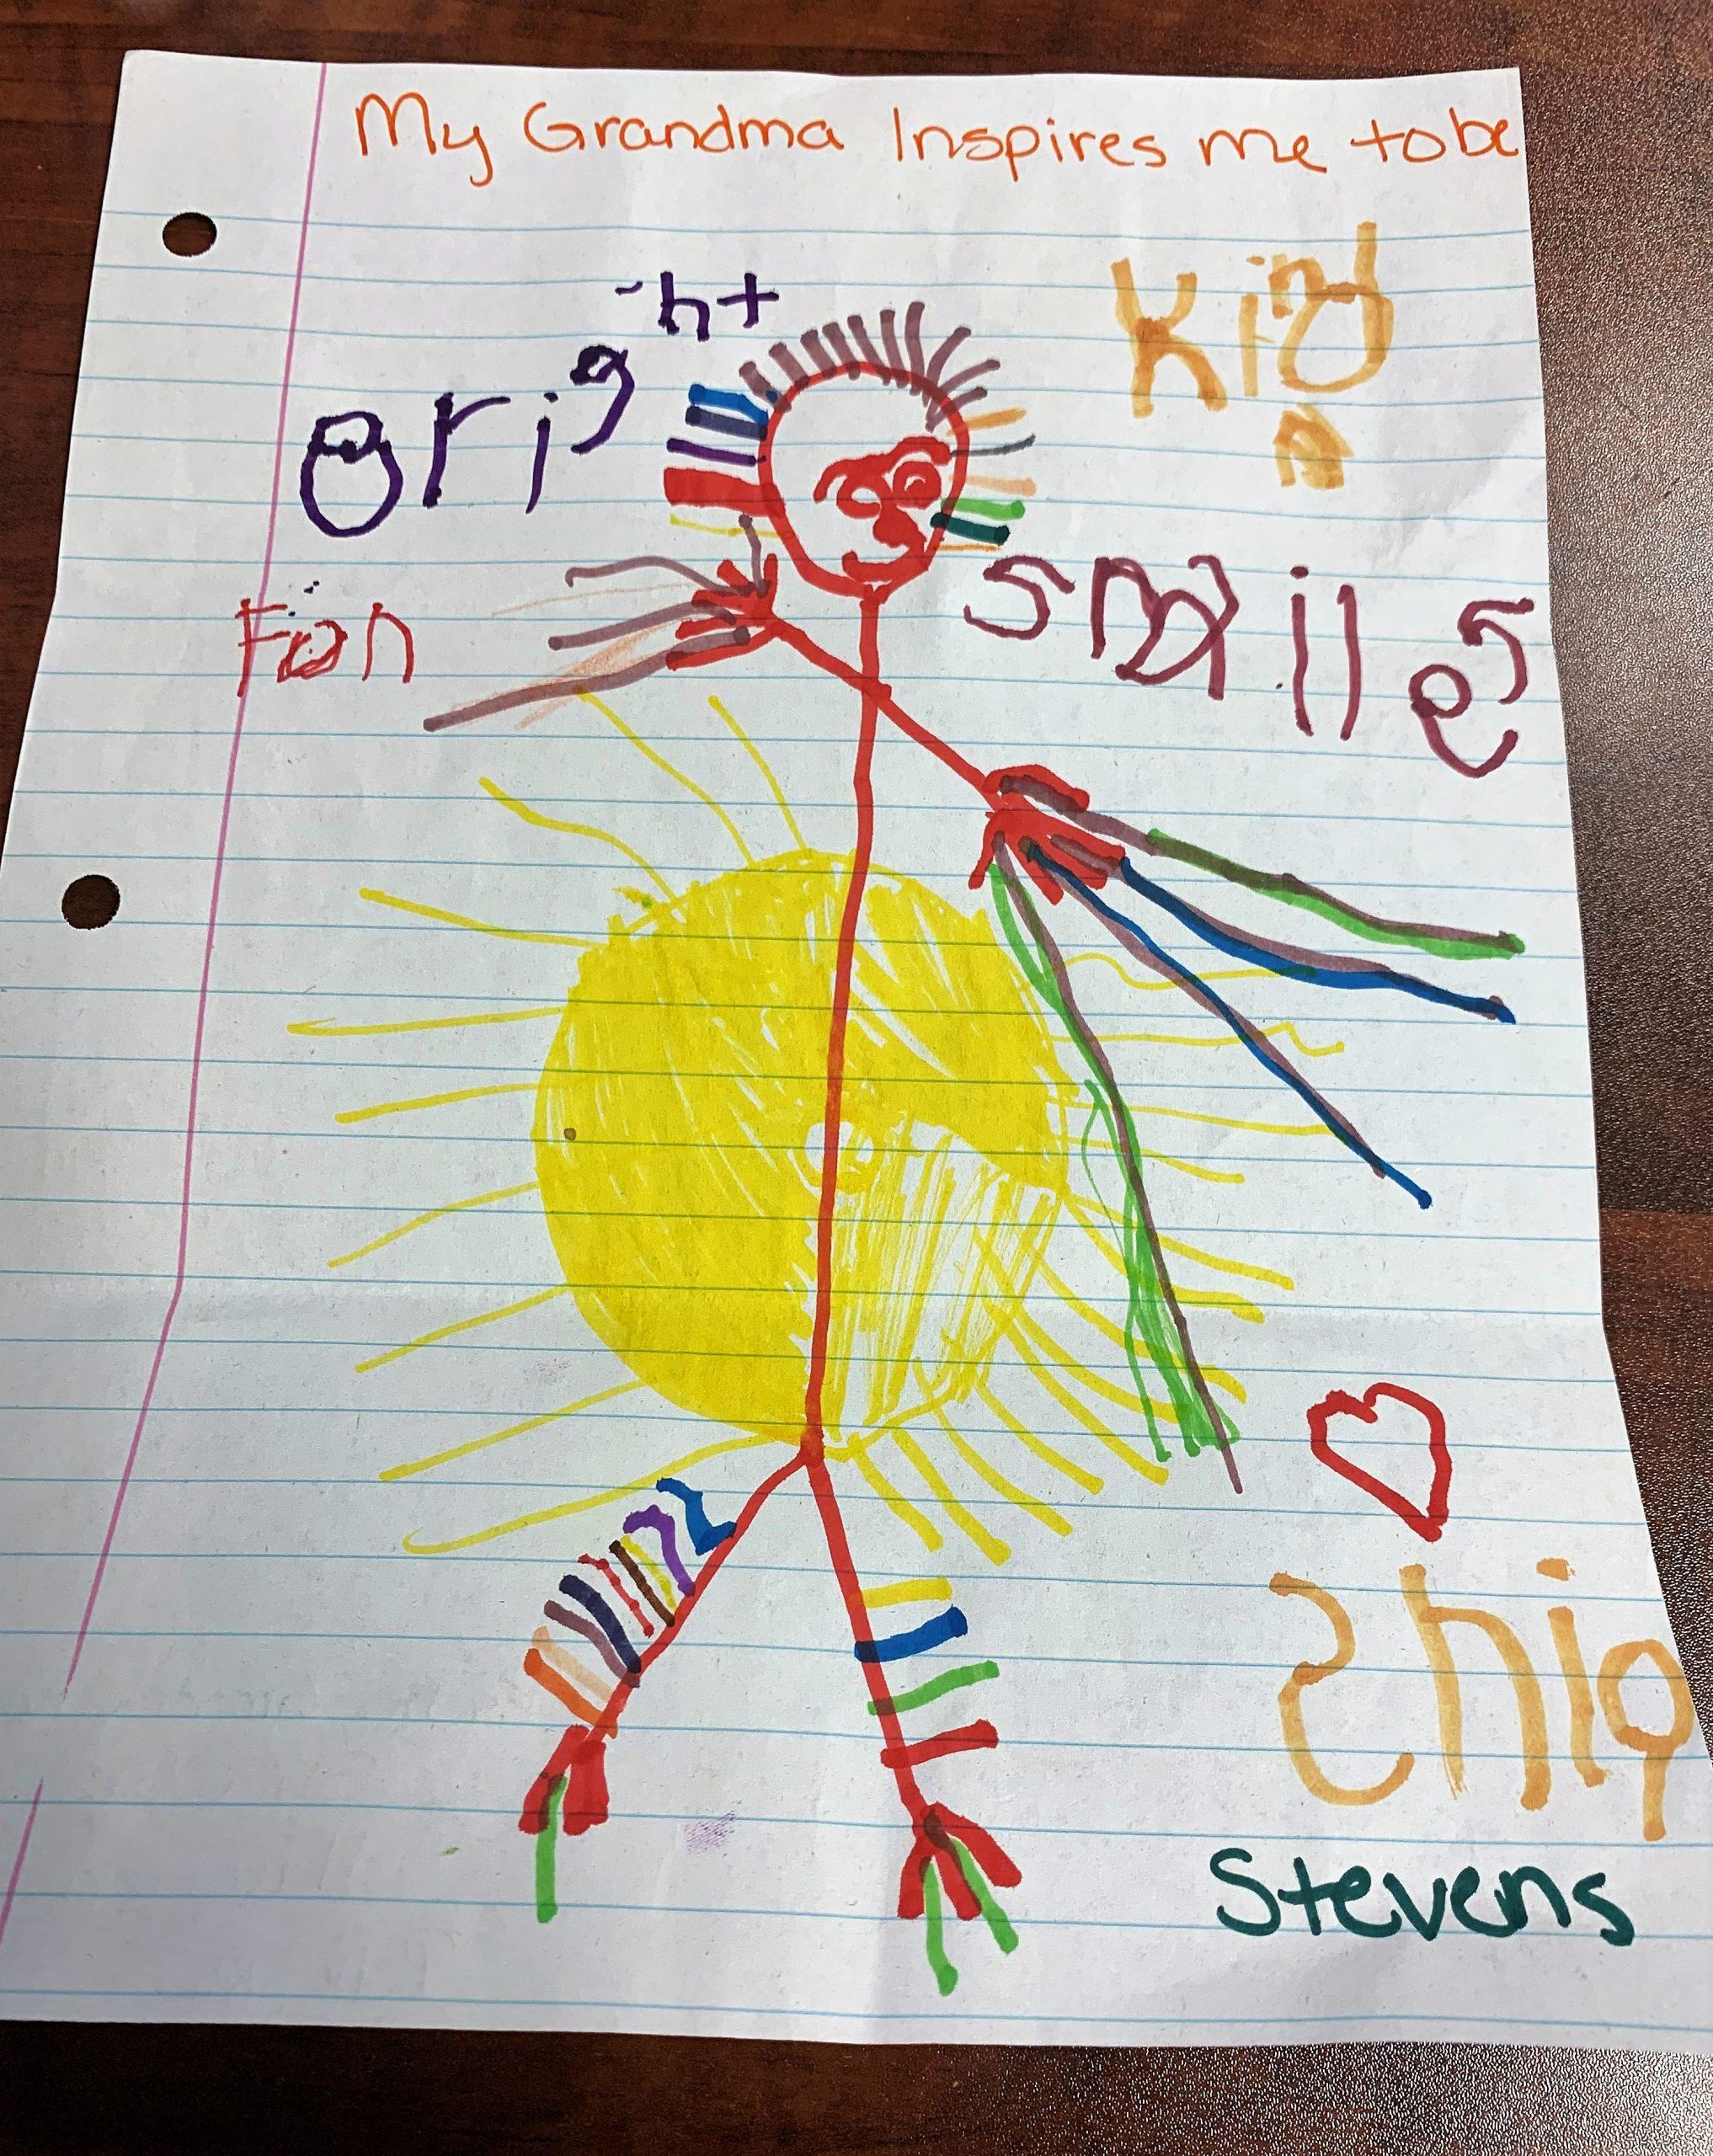 (Shia S.'s Winning Drawing)